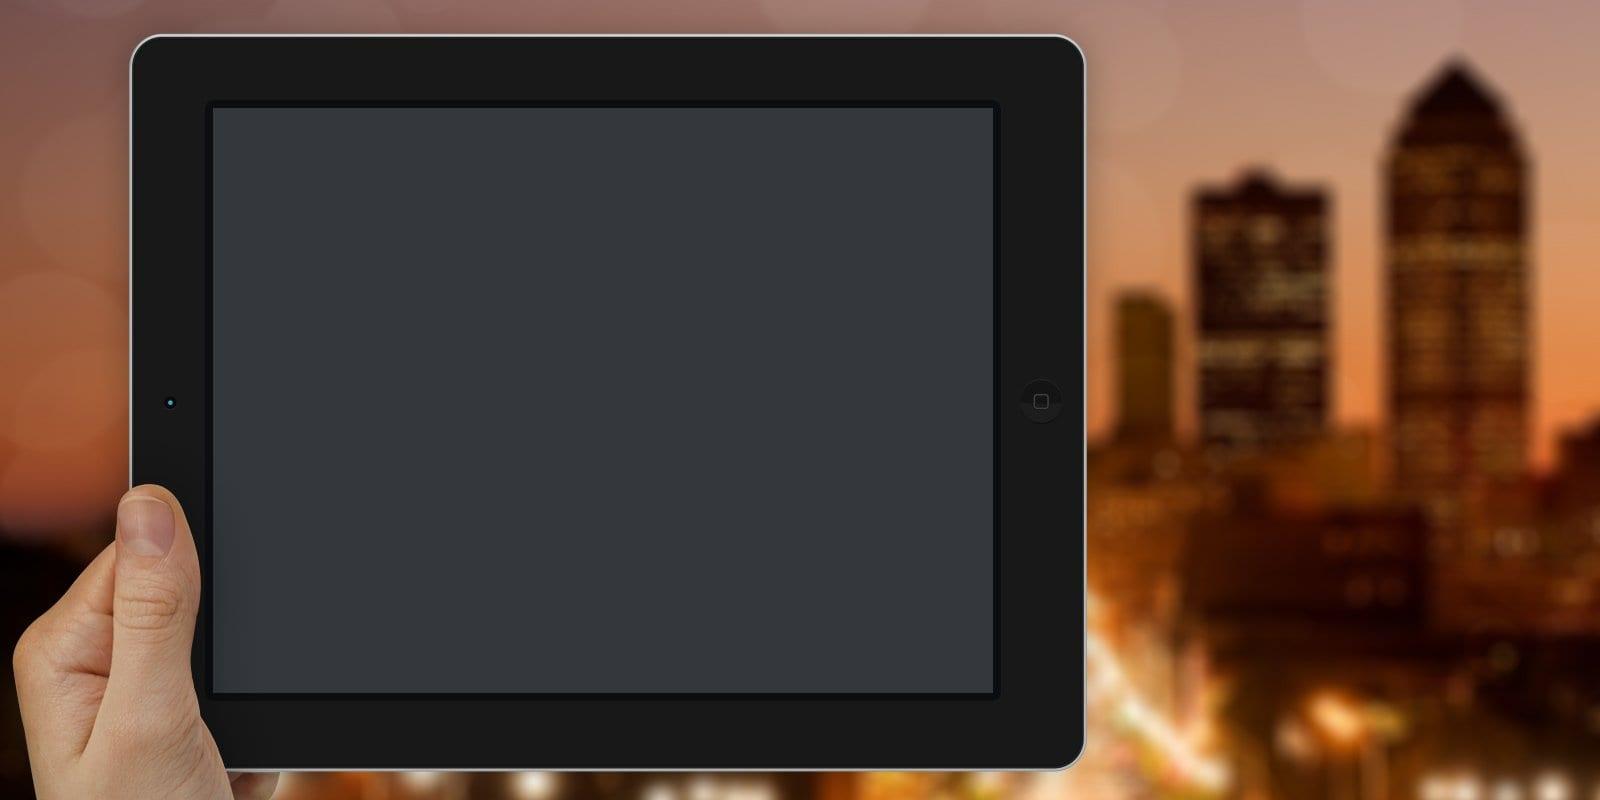 iPad Des Moines skyline